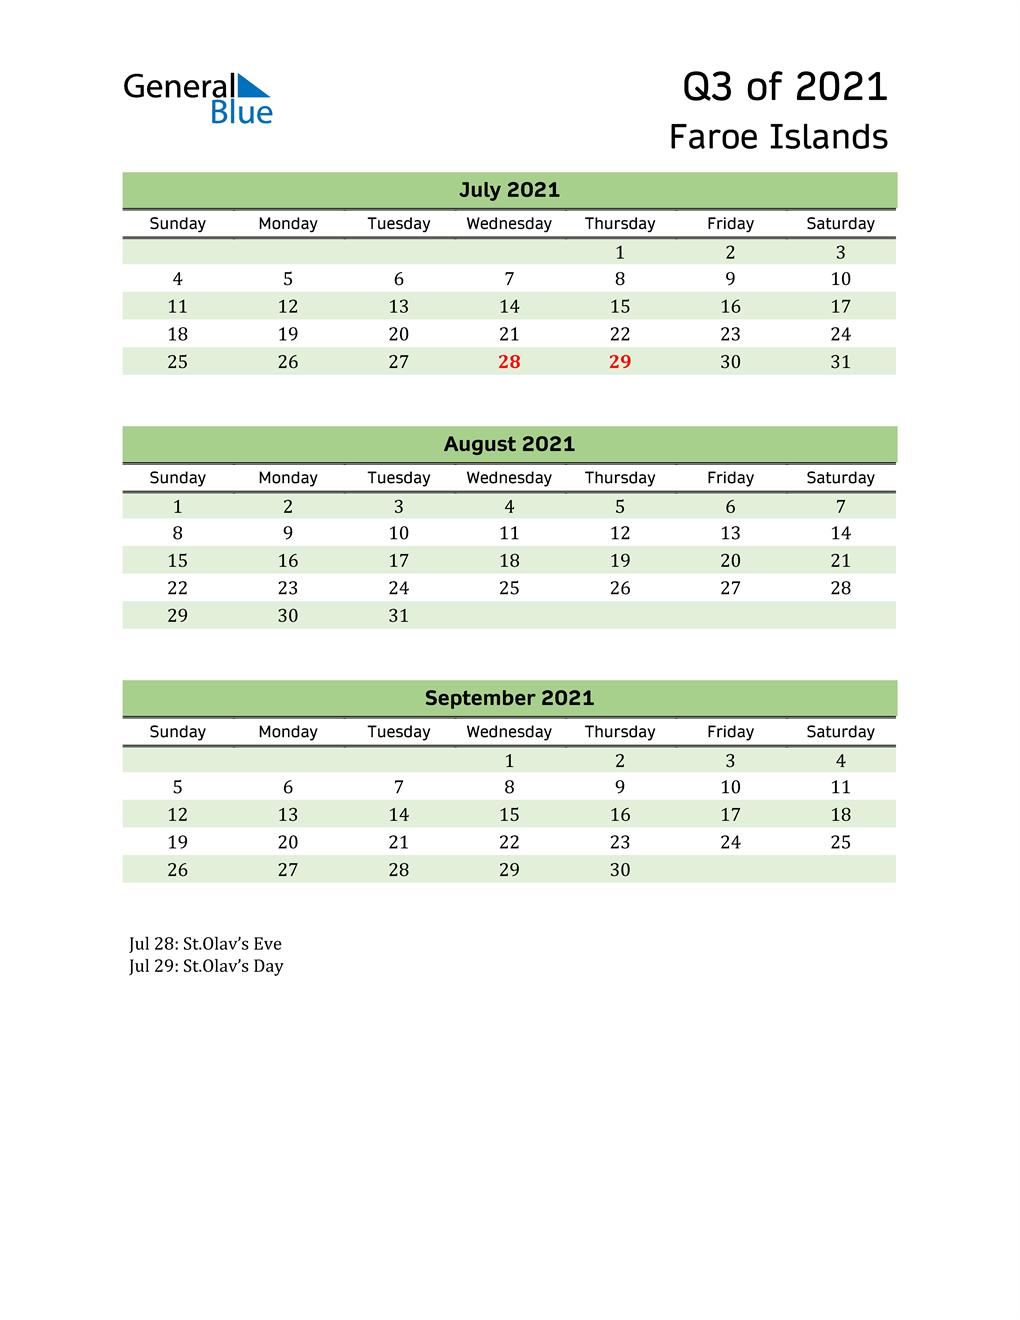 Quarterly Calendar 2021 with Faroe Islands Holidays